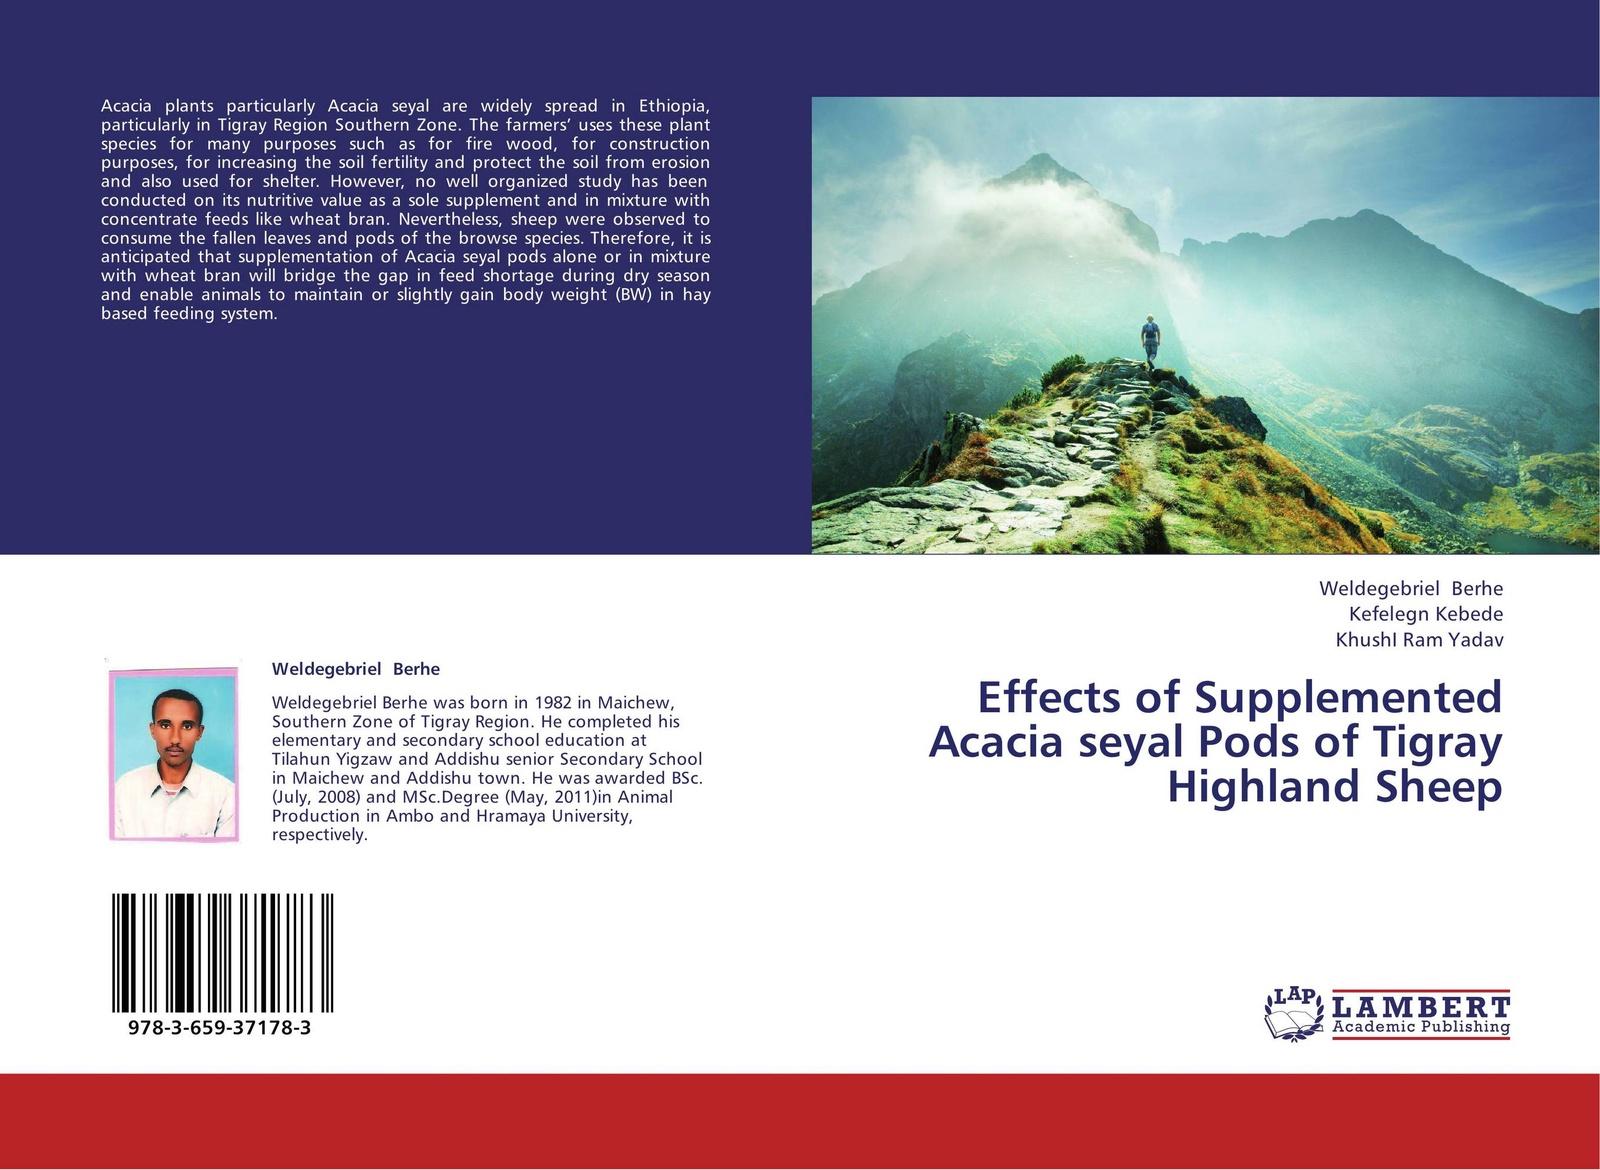 Weldegebriel Berhe,Kefelegn Kebede and KhushI Ram Yadav Effects of Supplemented Acacia seyal Pods of Tigray Highland Sheep acacia page 8